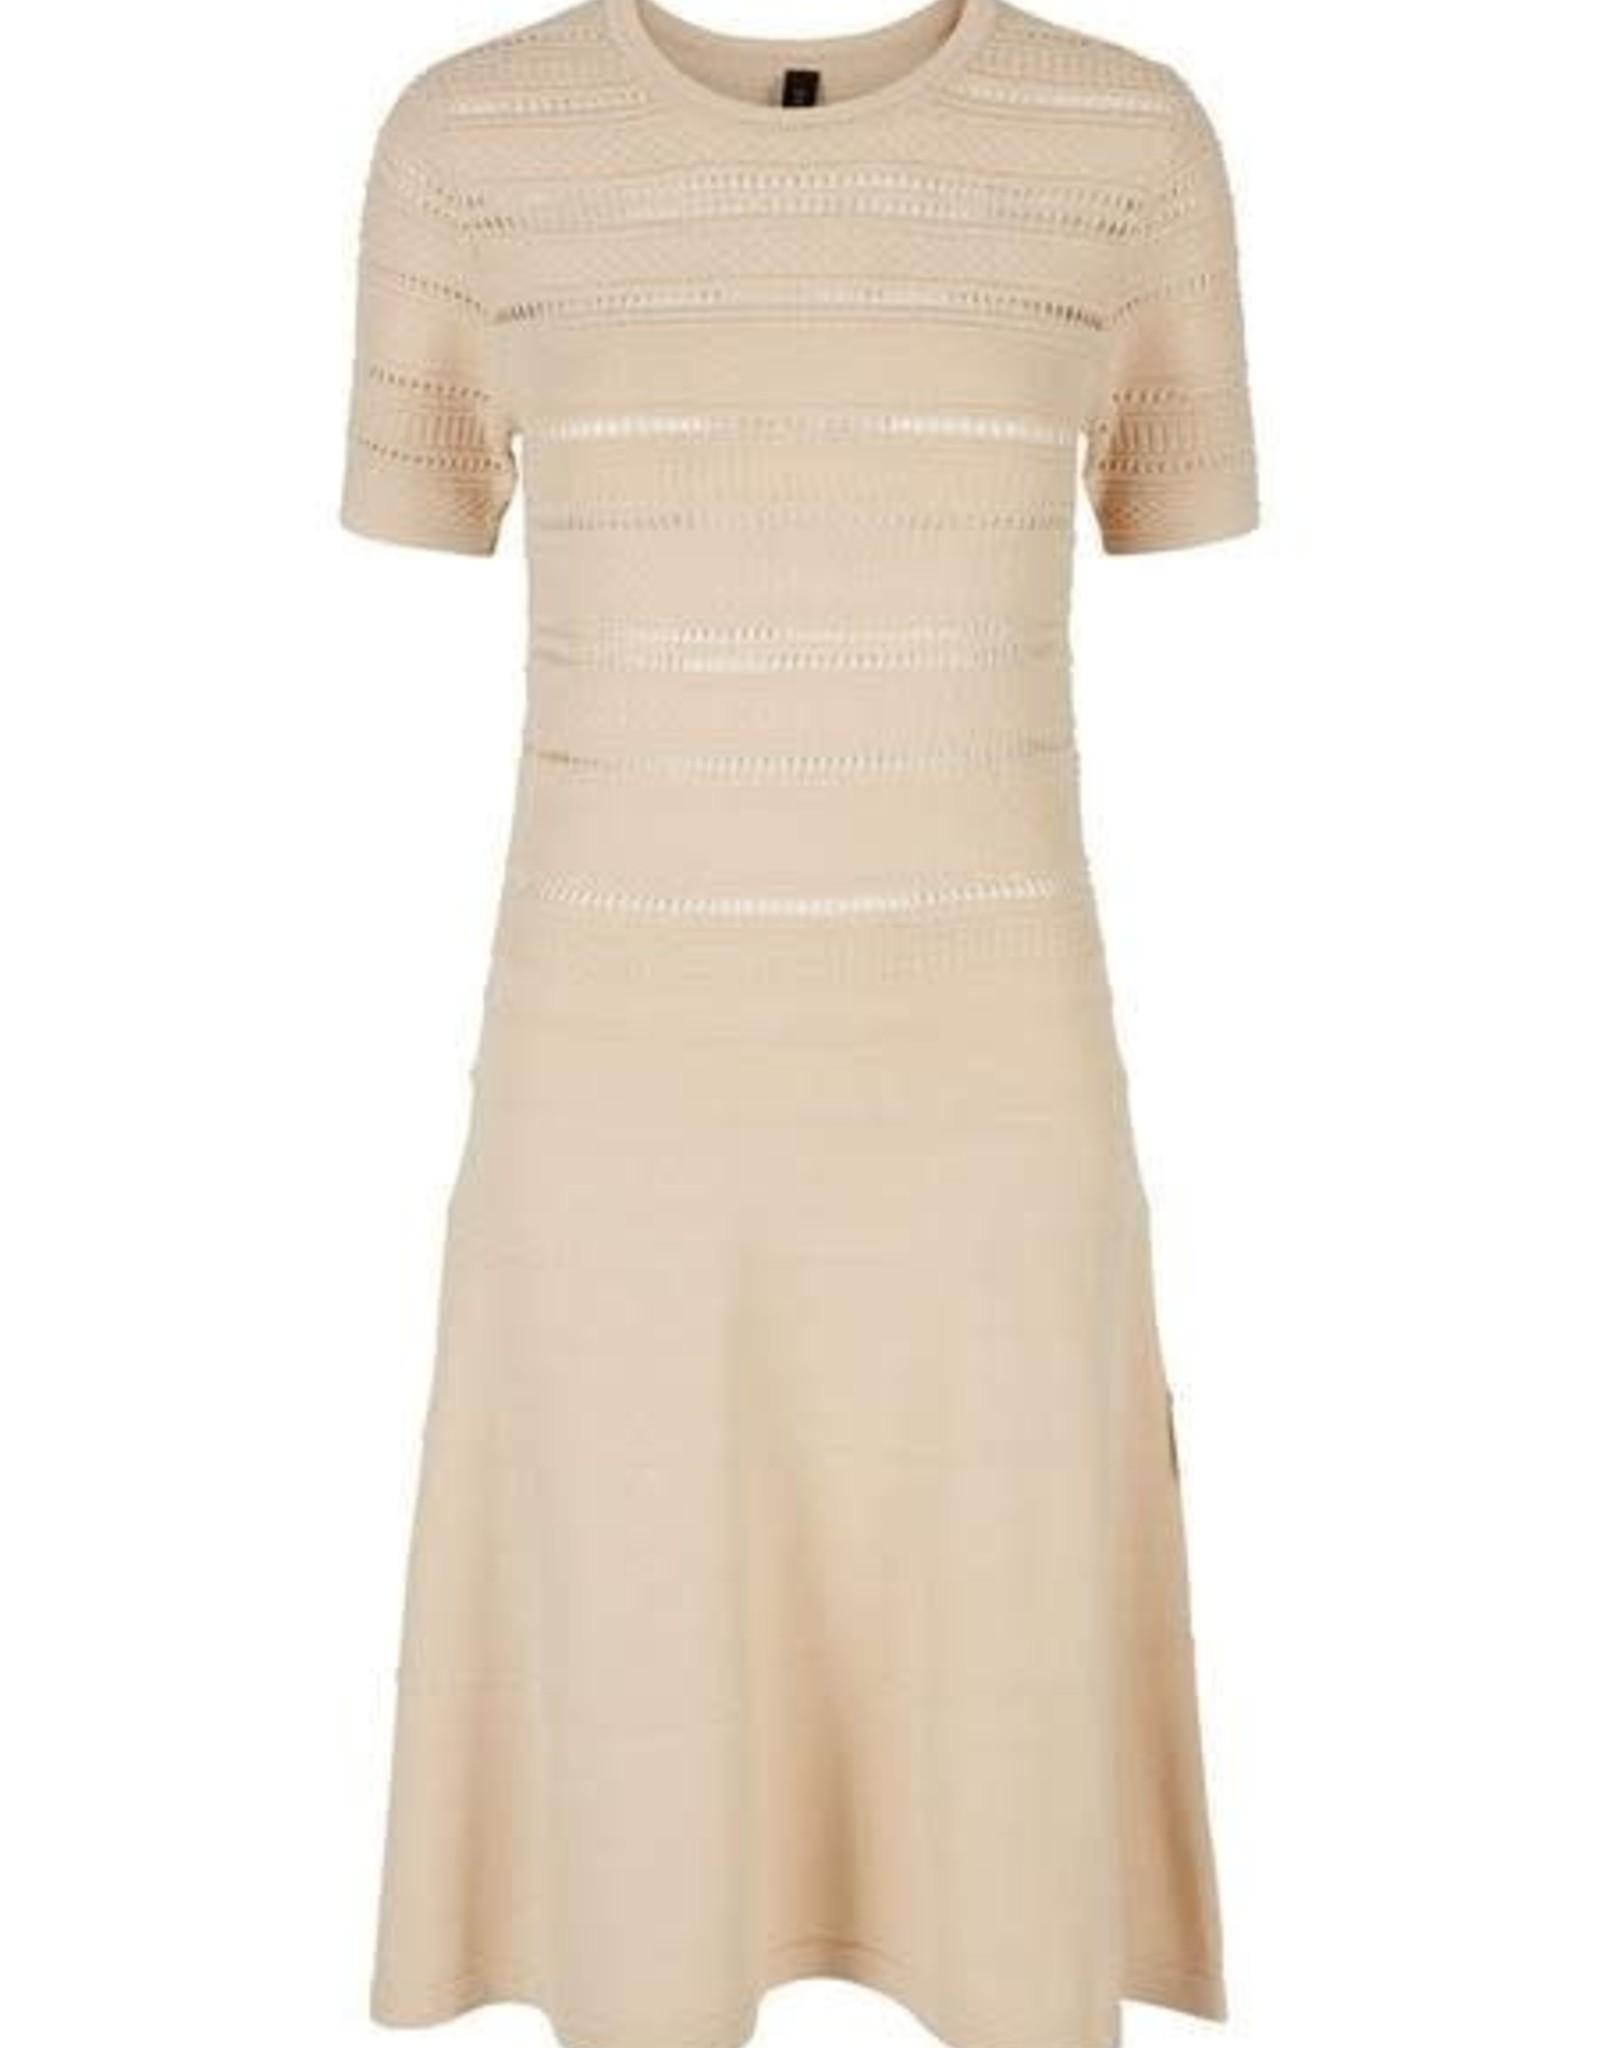 Y.A.S Yasakisa Knit Dress